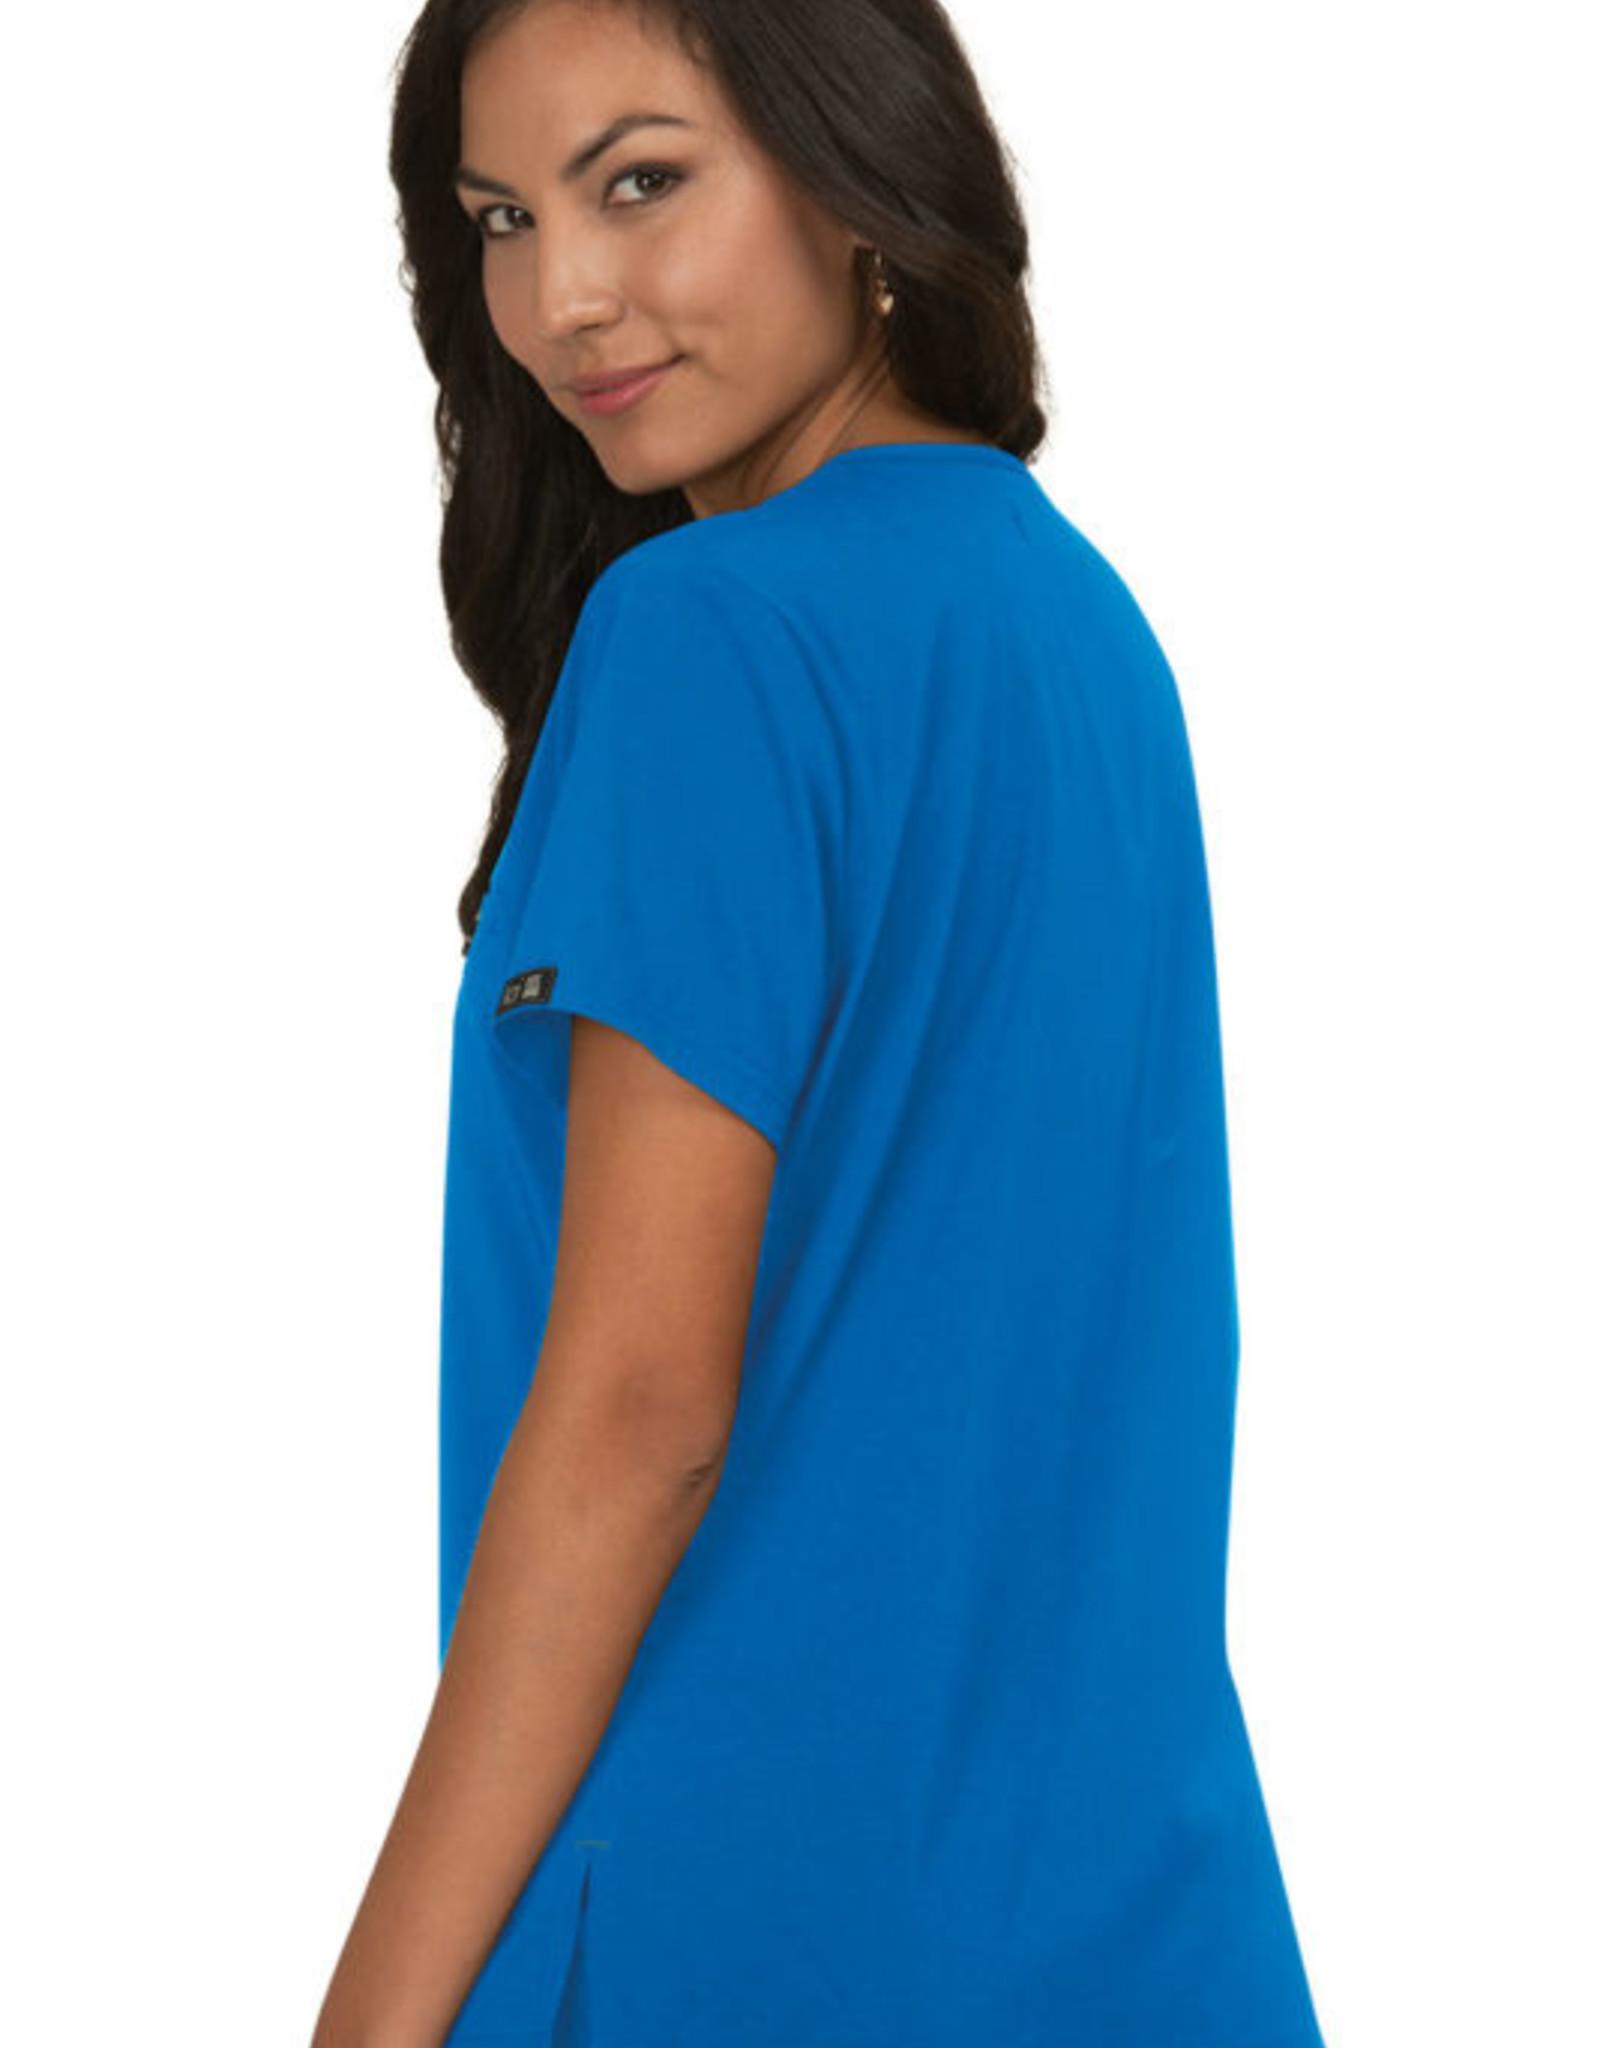 Koi Basics Koi 1011 Kade Tuck In Top Royal Blue